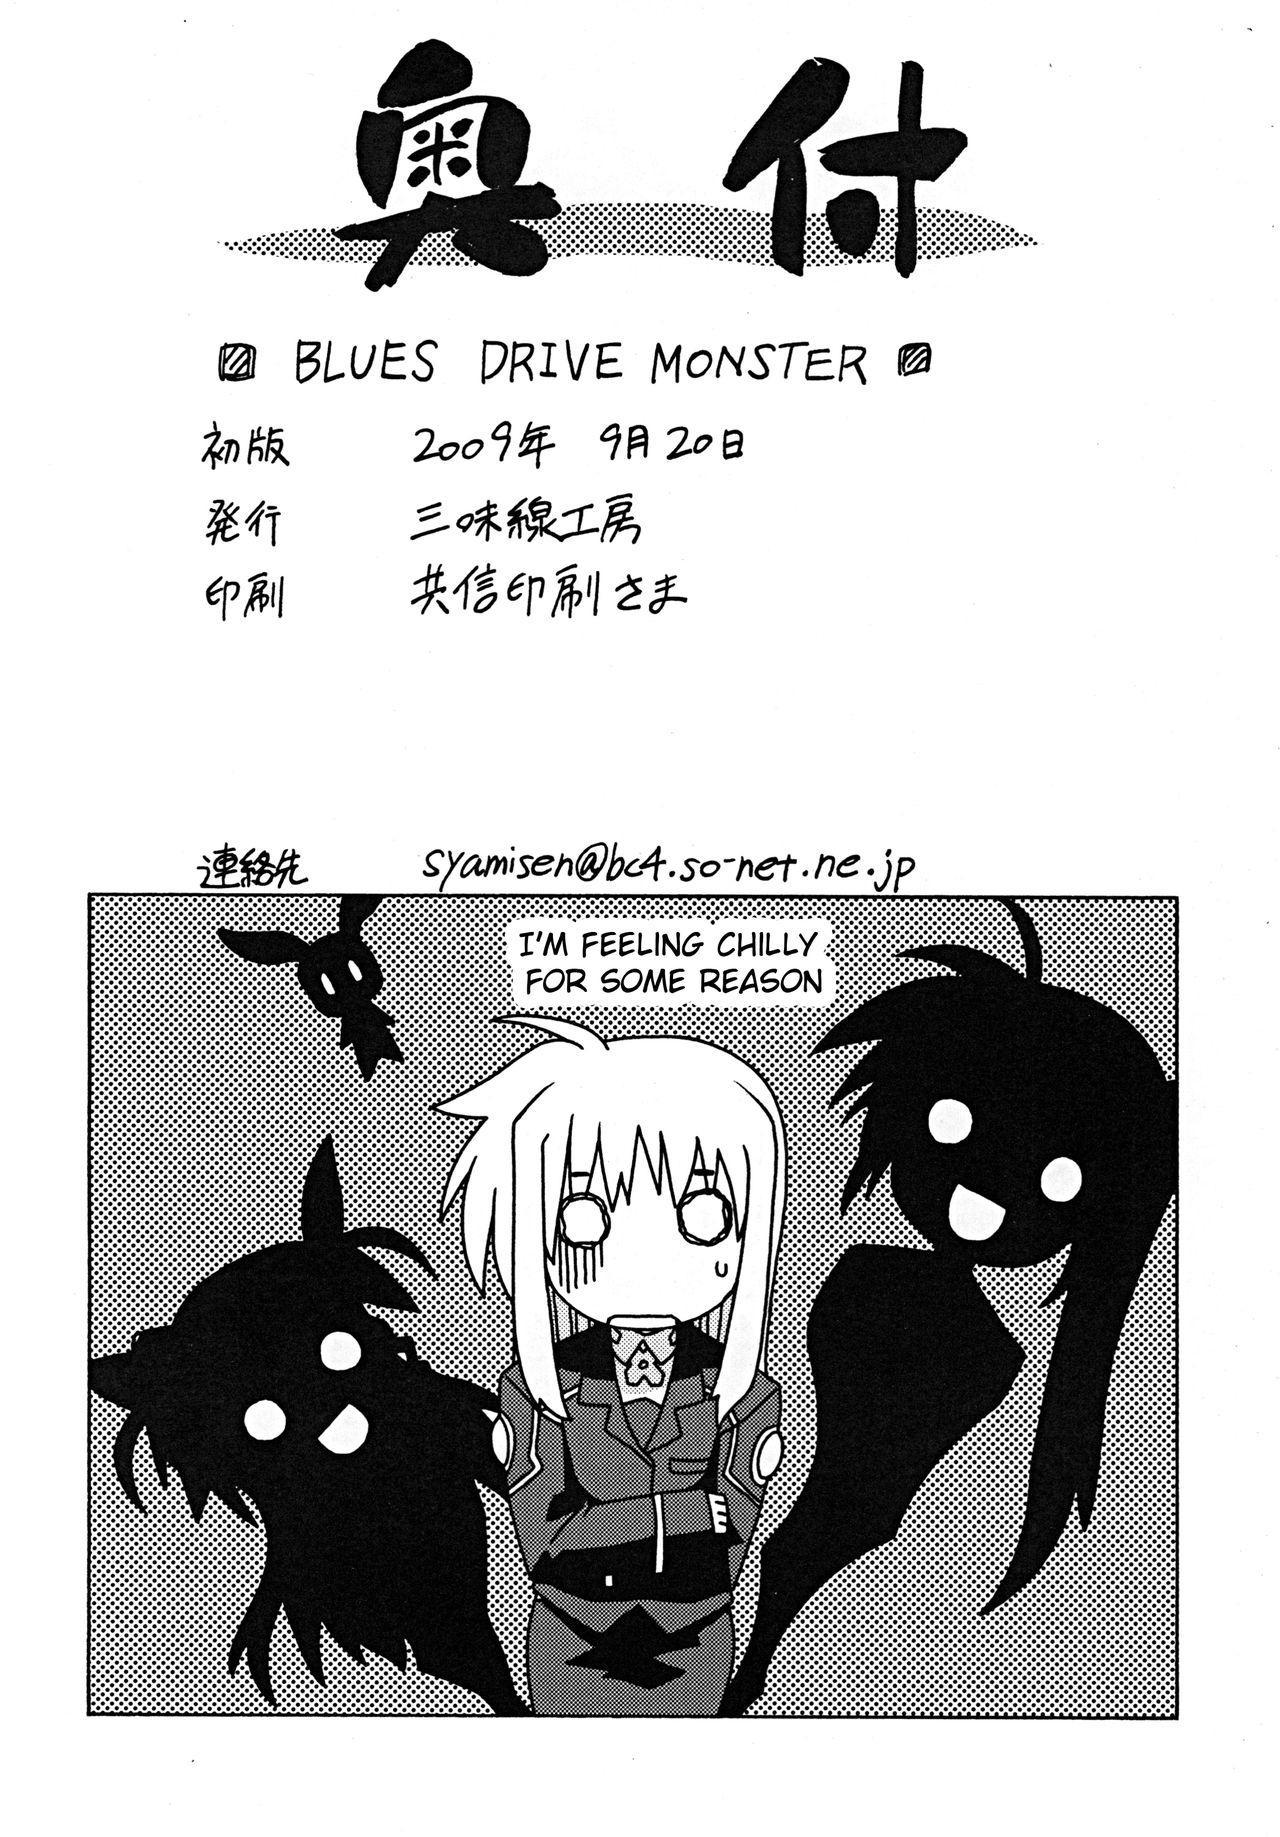 BLUES DRIVE MONSTER 20